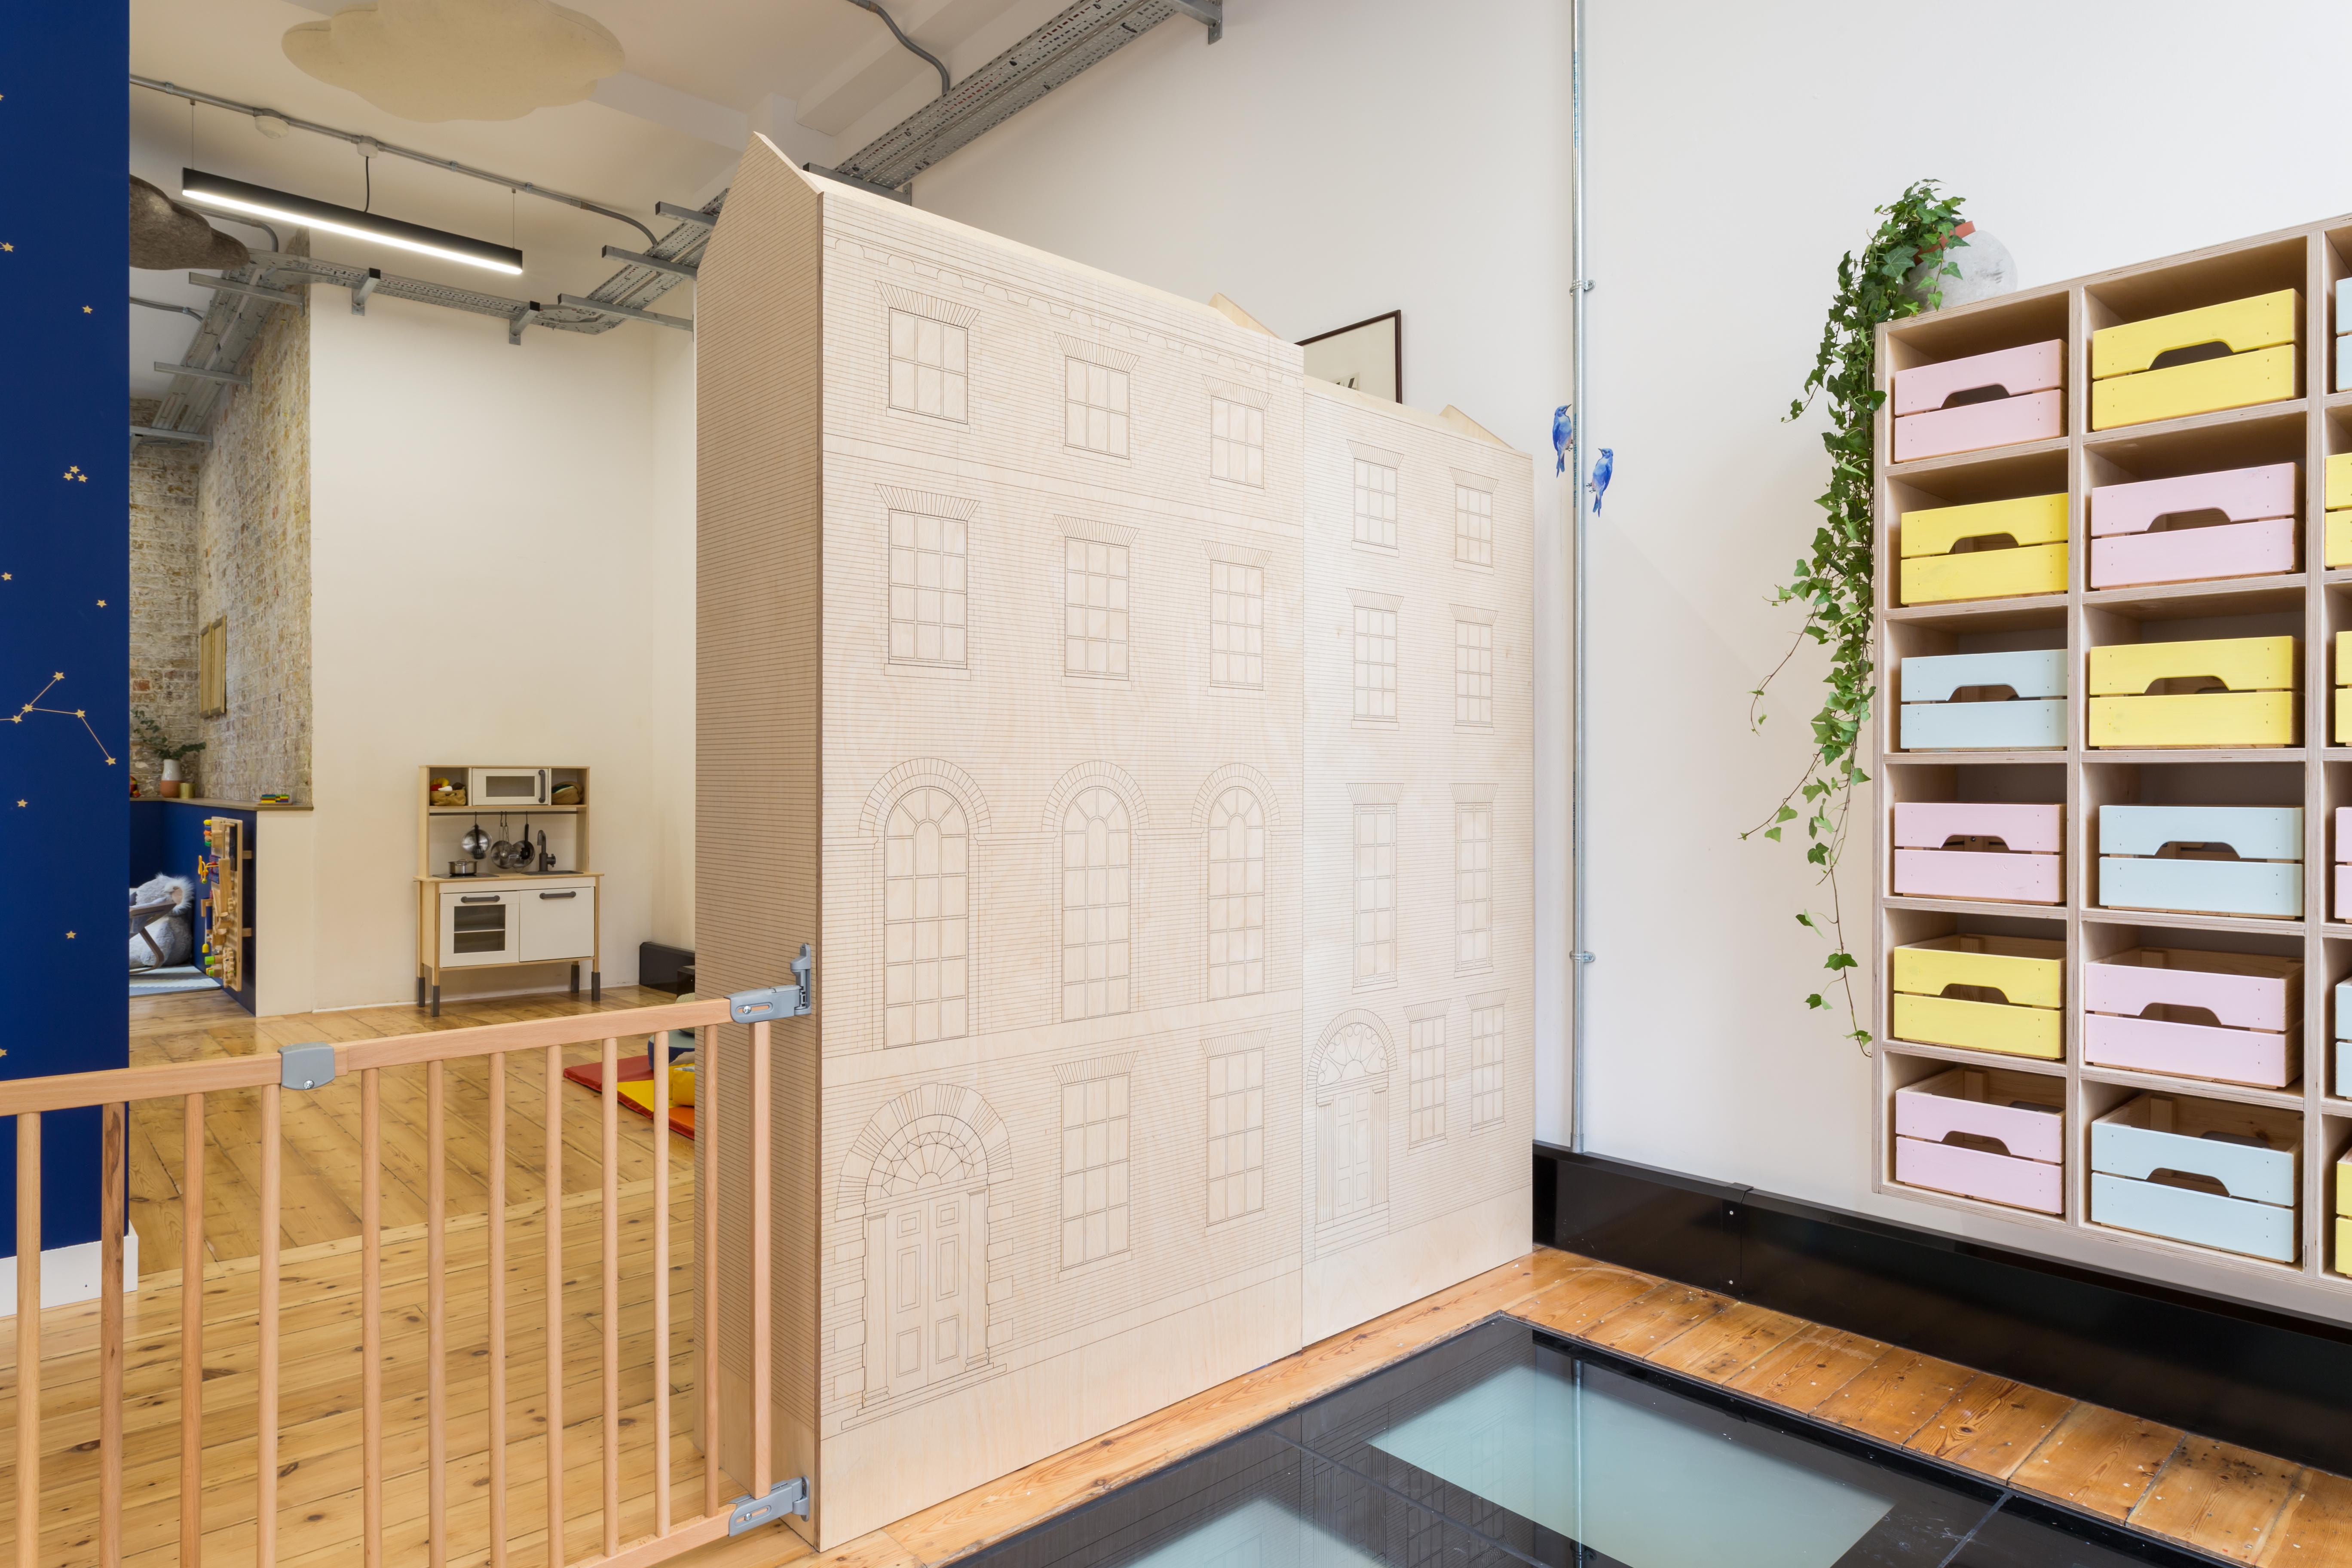 contemporary creche interior